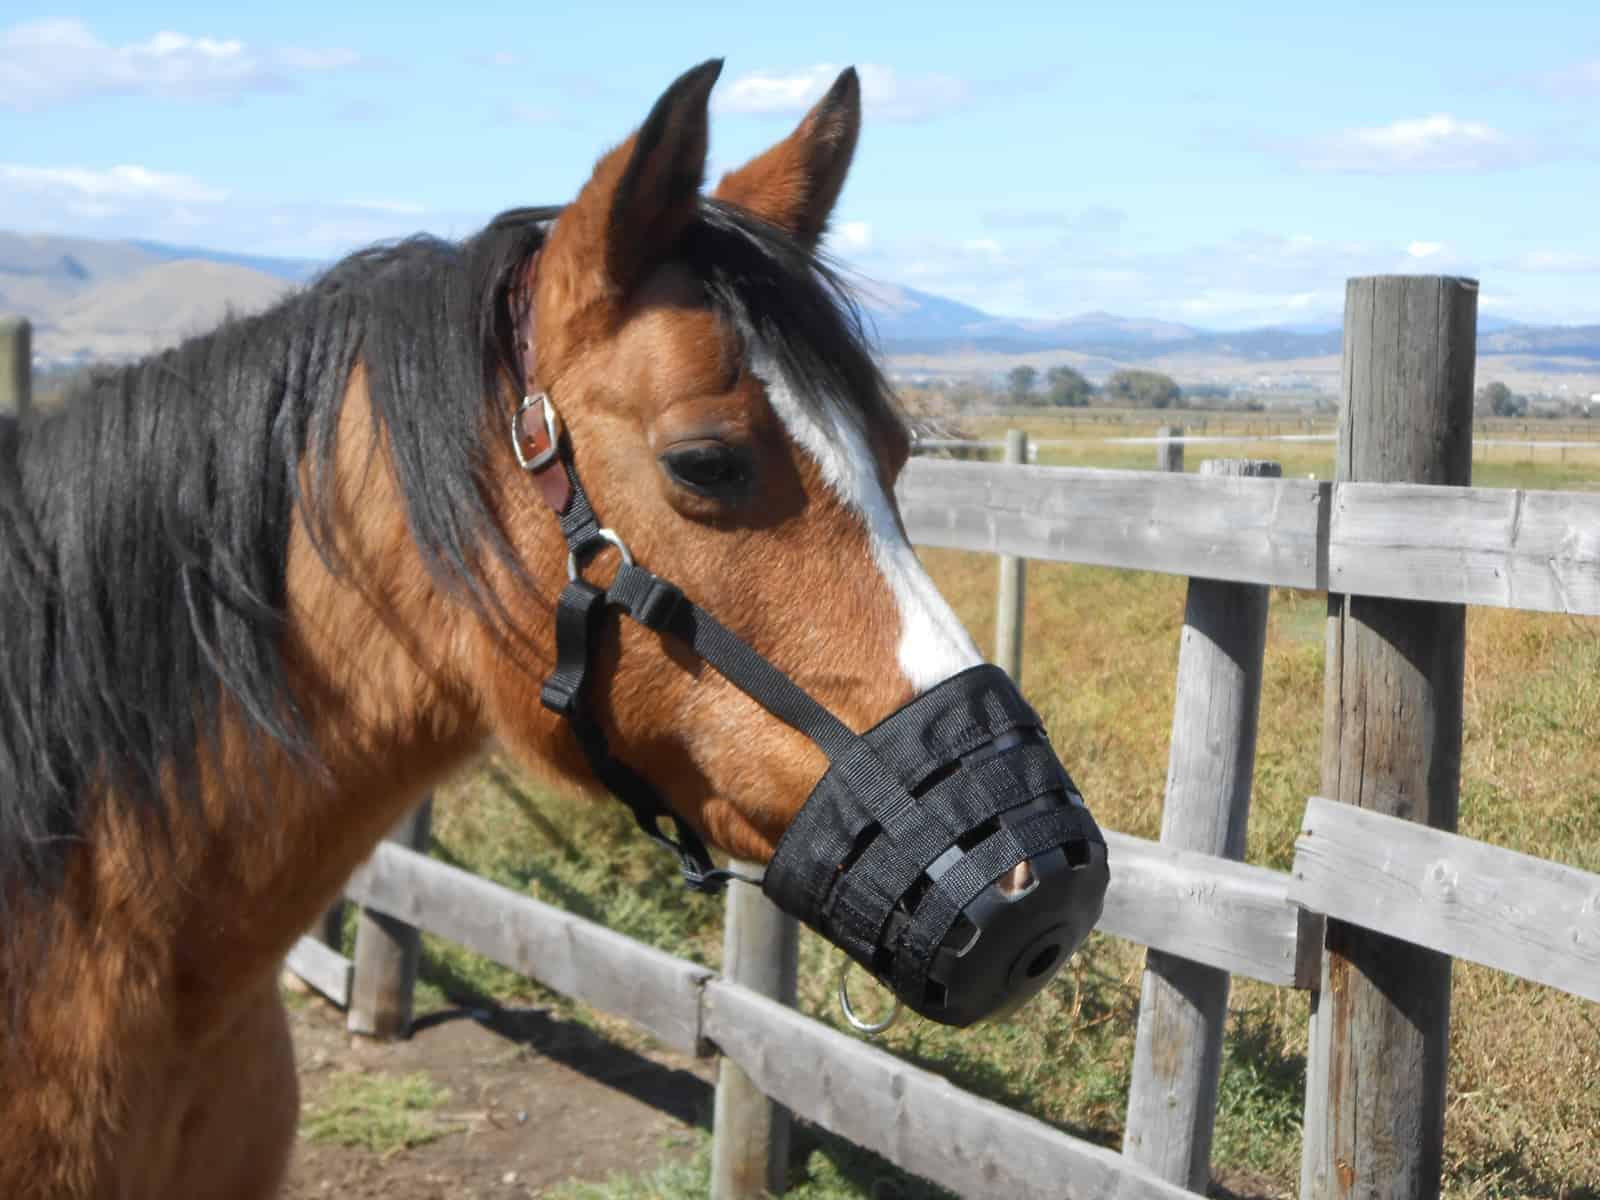 Addressing the 'Air Fern' in Your Barn